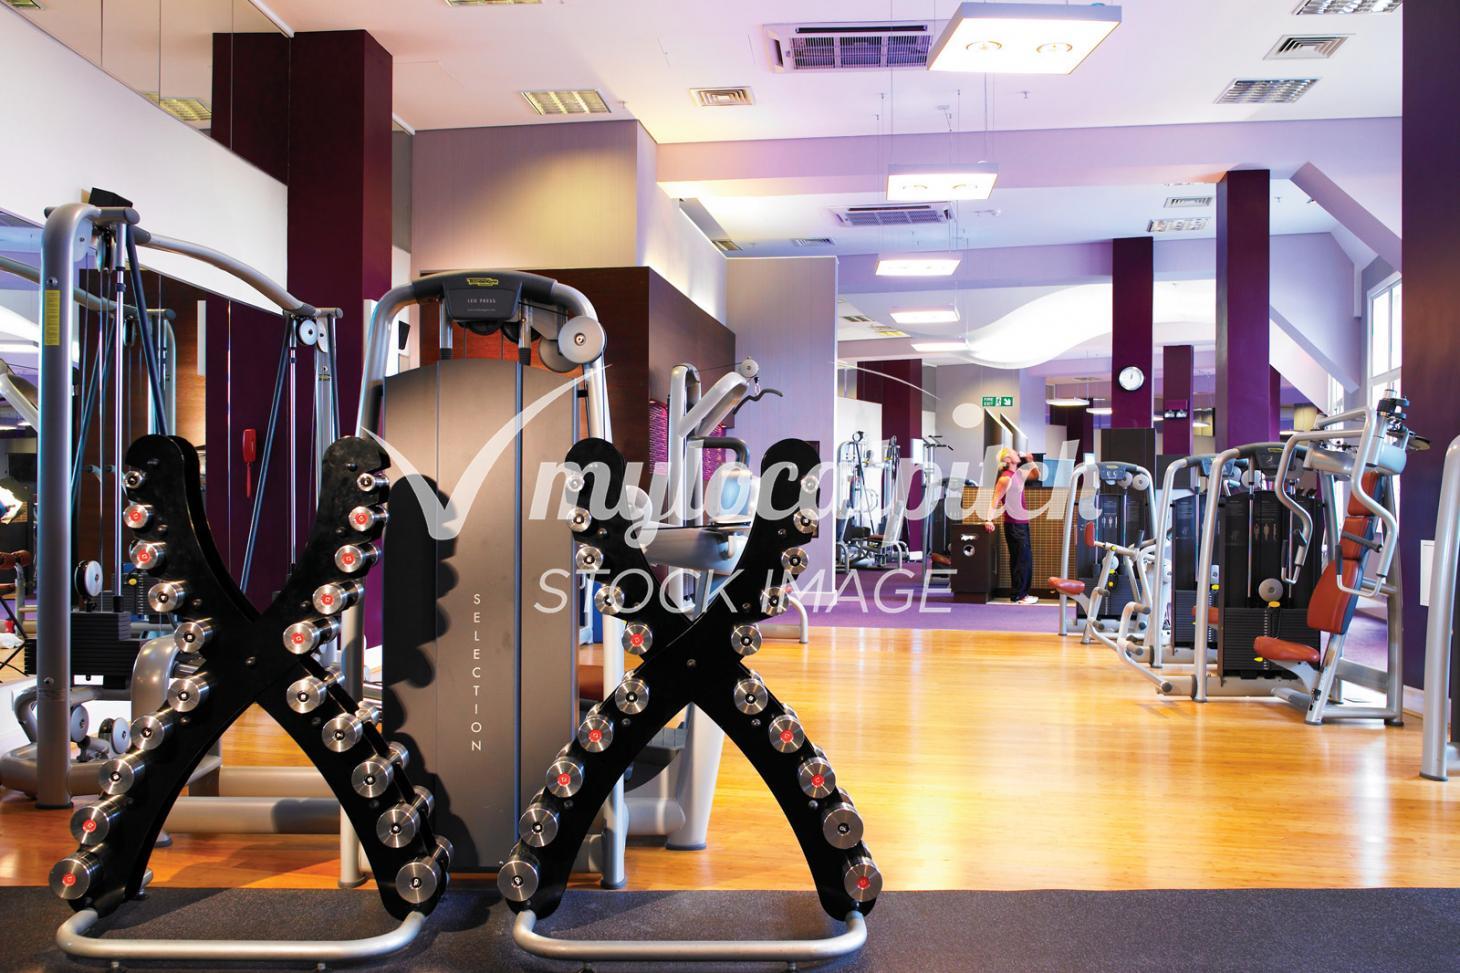 Forest Hill Pools Gym gym